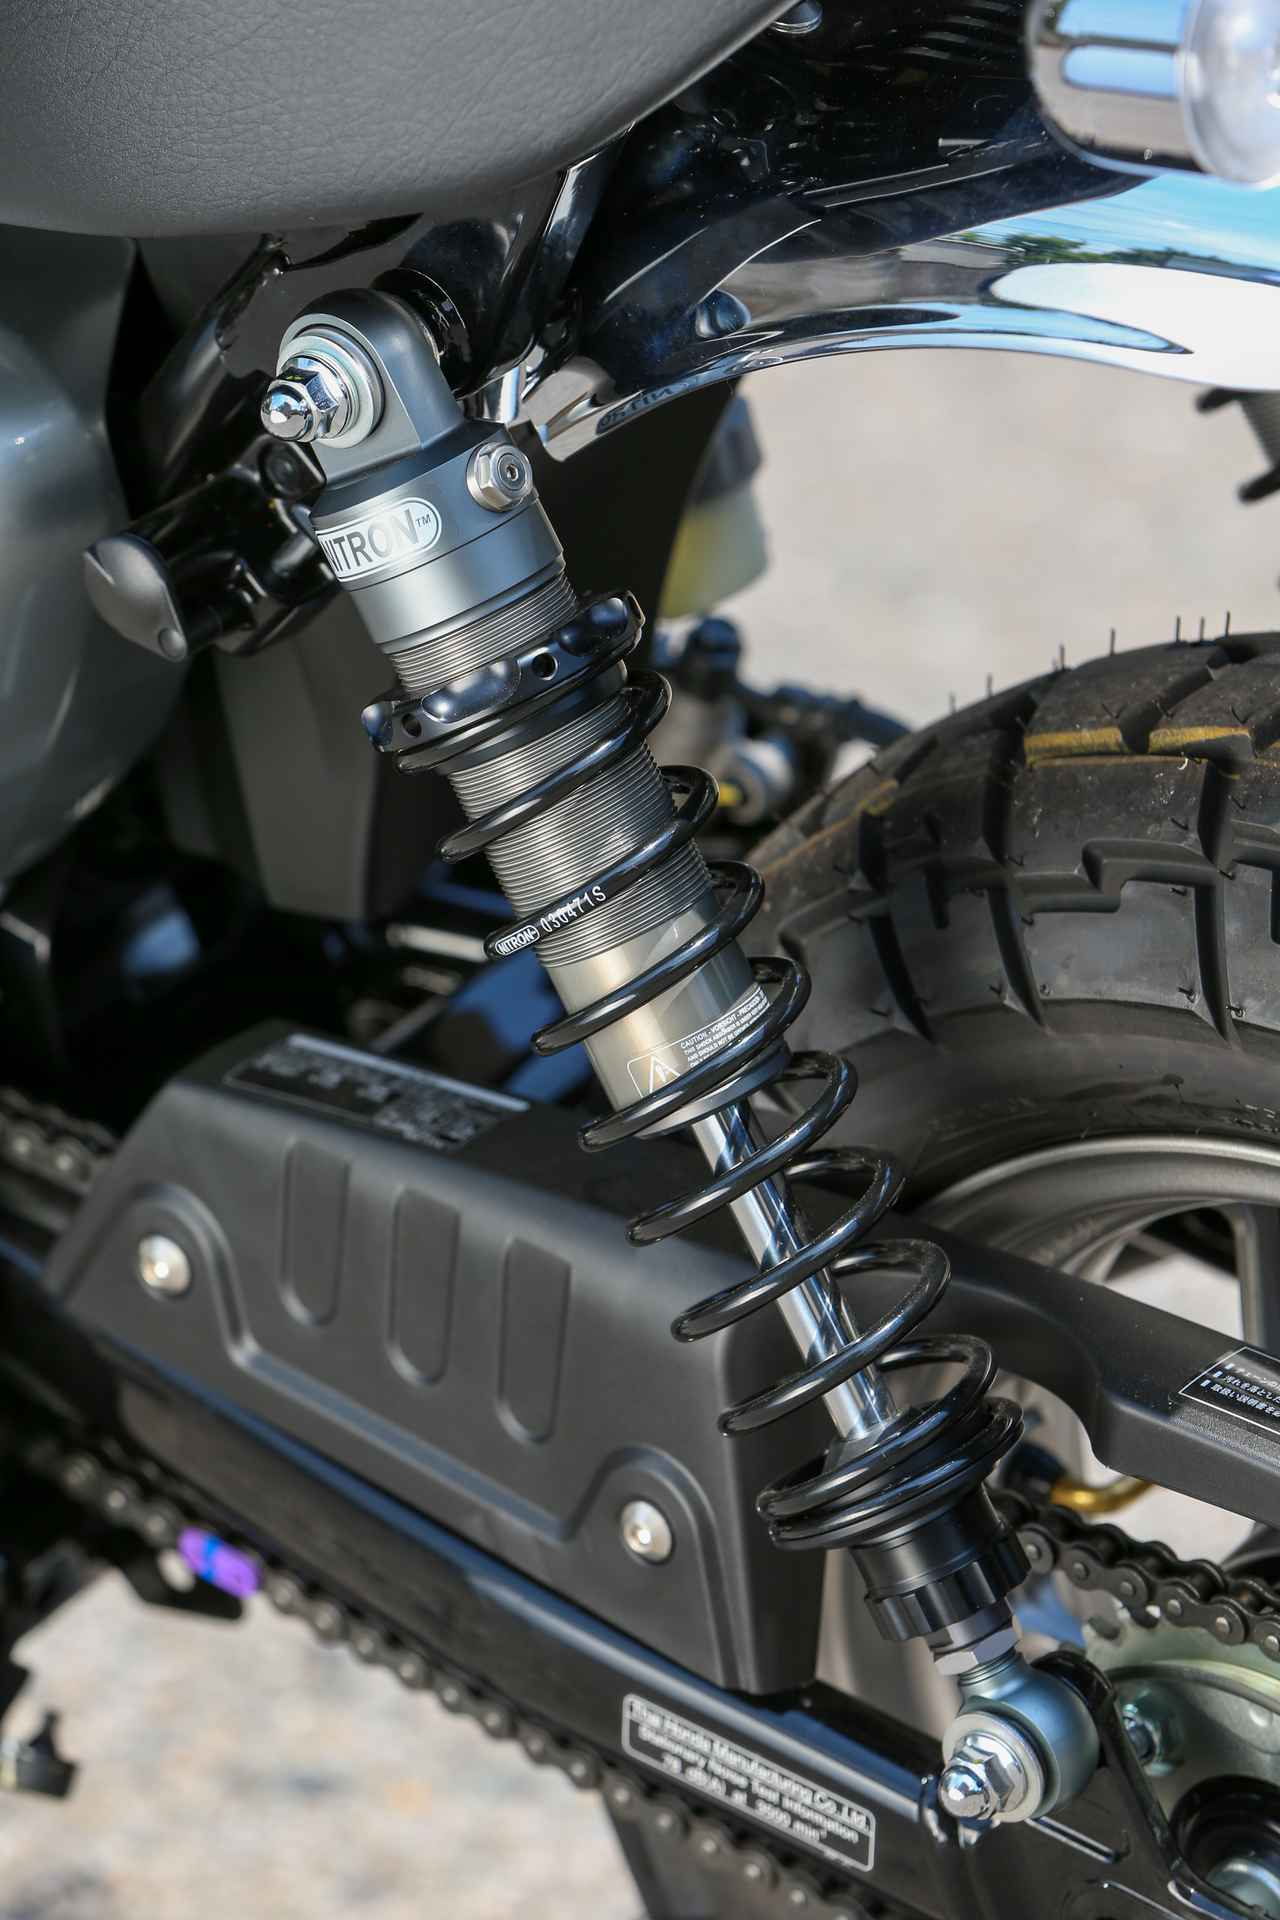 Images : 21番目の画像 - 気になるモンキーFSの写真をもっと見る! - LAWRENCE - Motorcycle x Cars + α = Your Life.